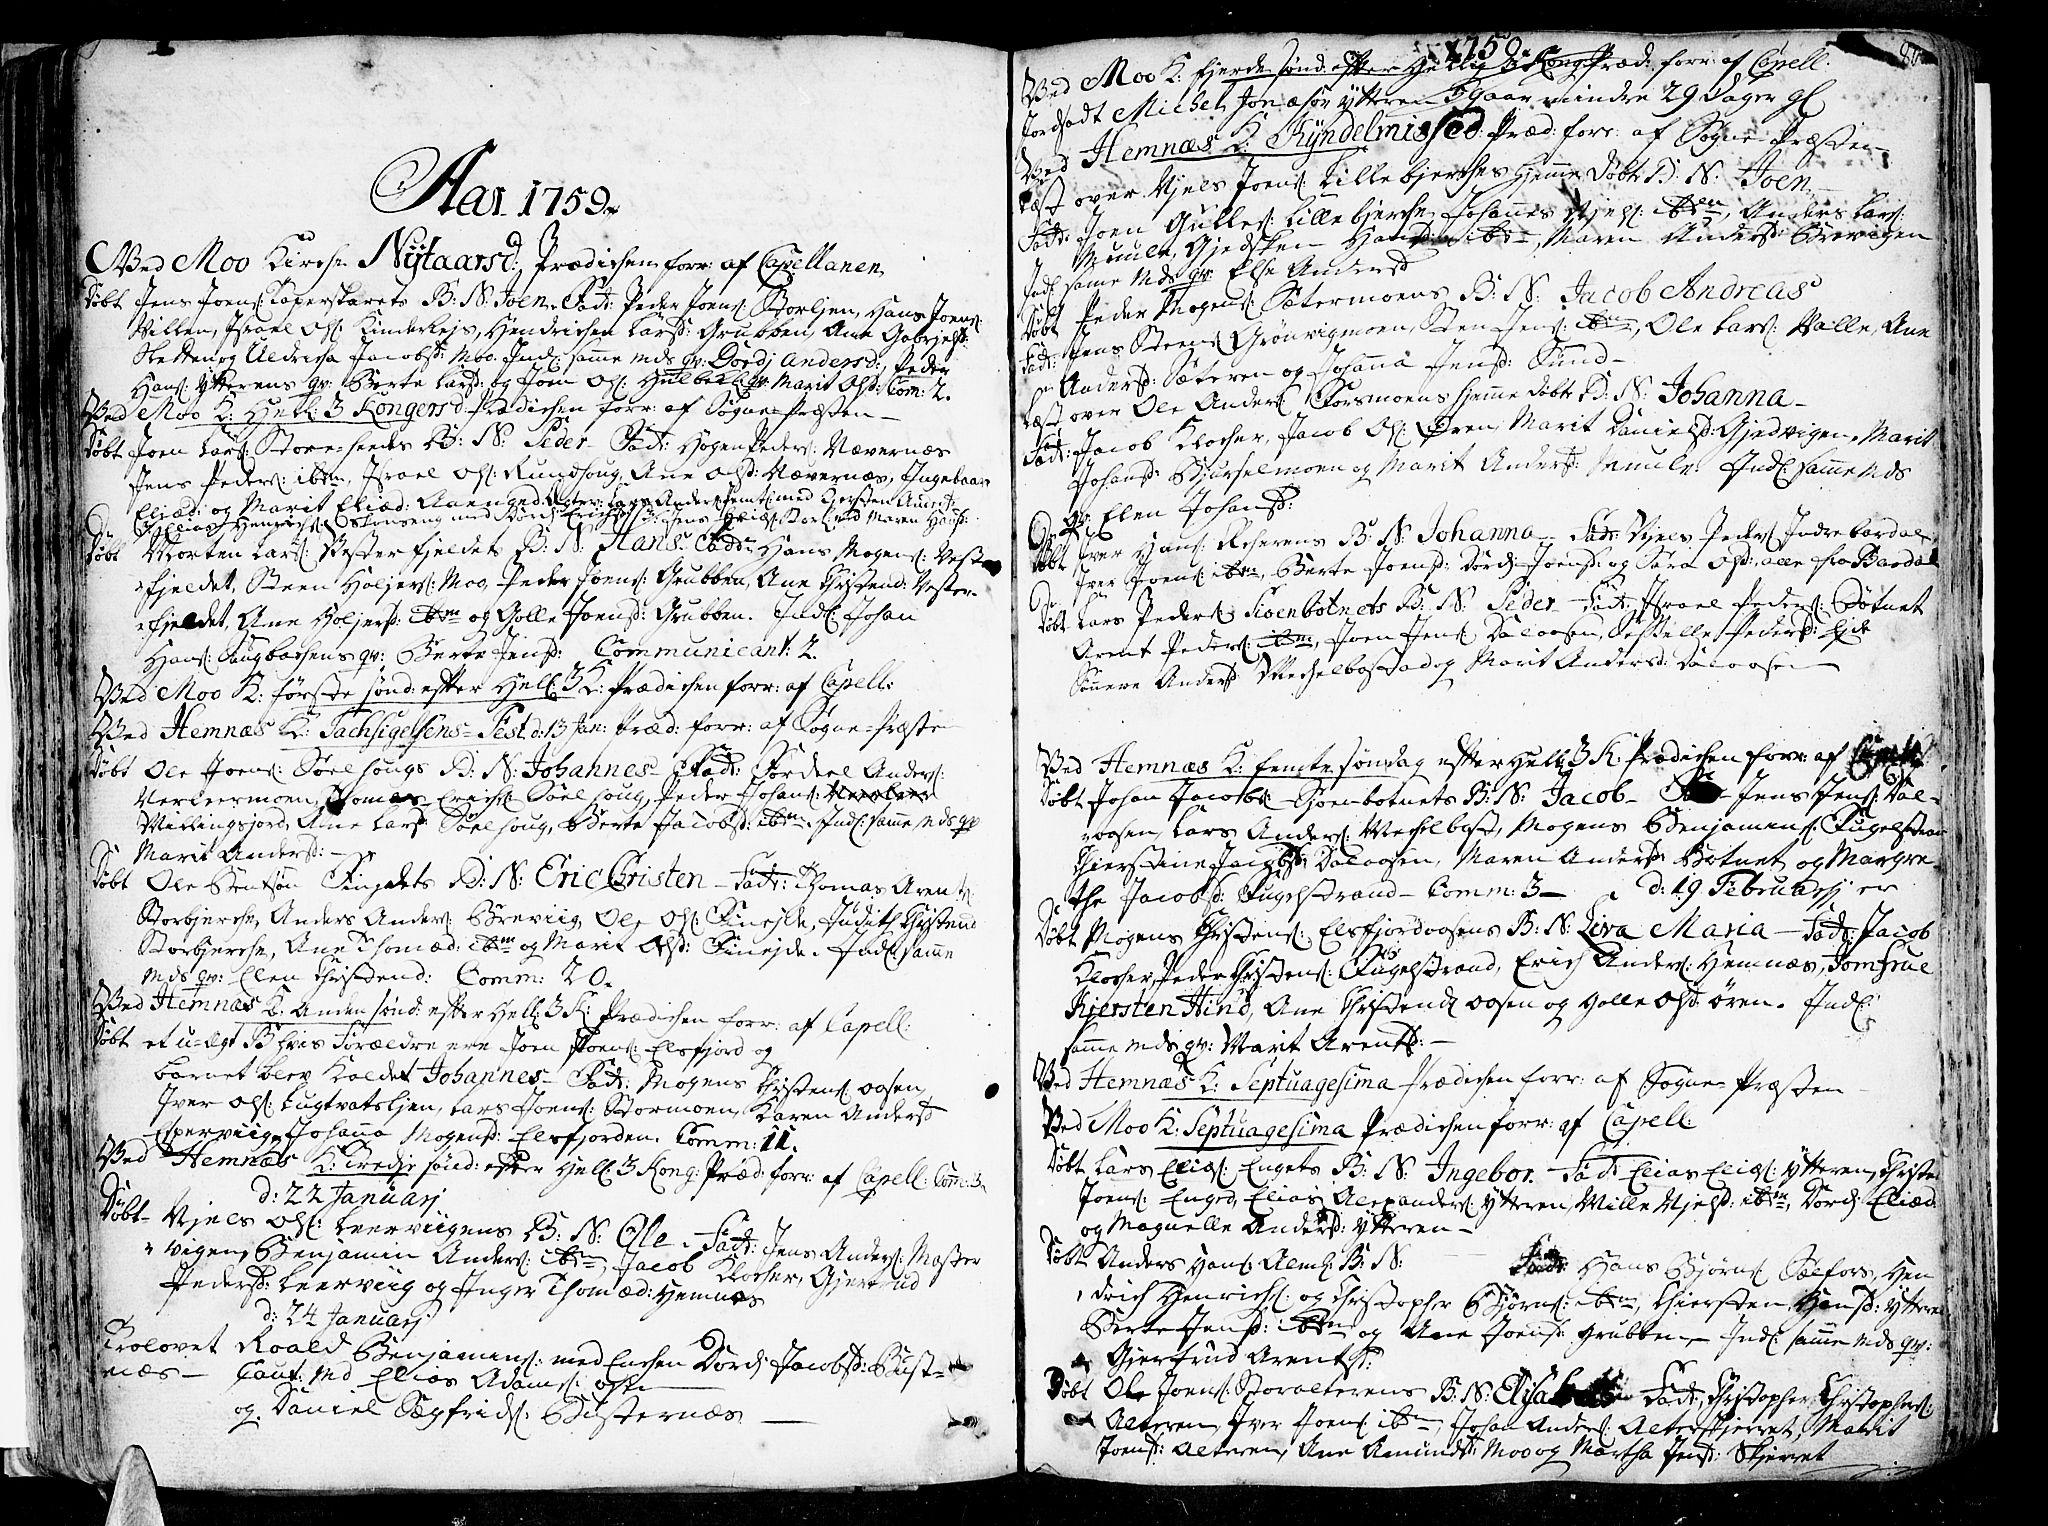 SAT, Ministerialprotokoller, klokkerbøker og fødselsregistre - Nordland, 825/L0348: Ministerialbok nr. 825A04, 1752-1788, s. 80